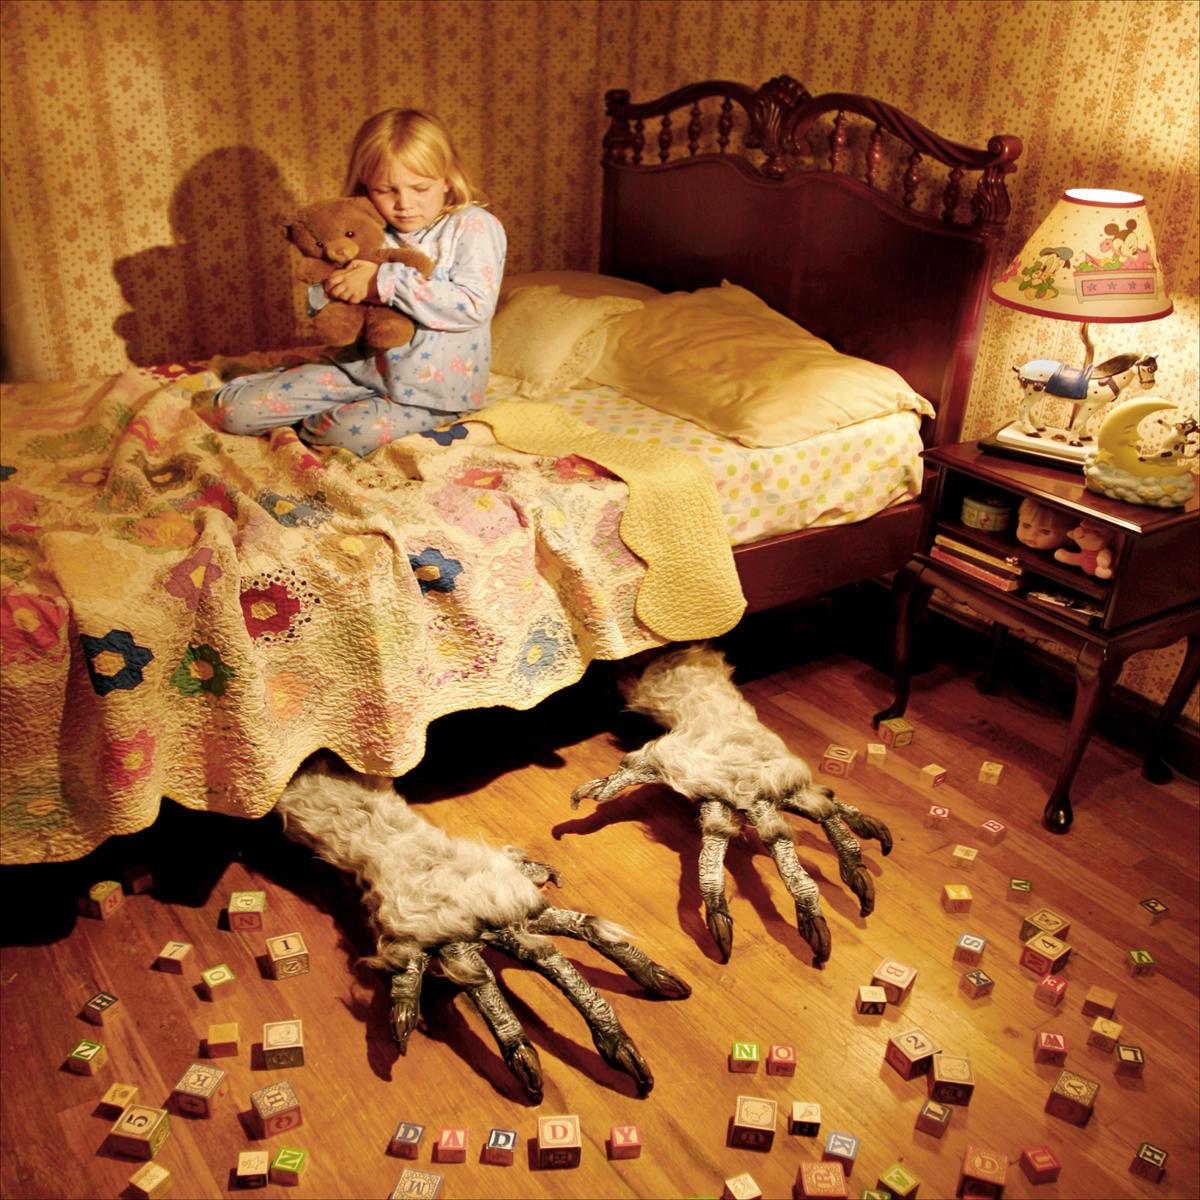 Мама, почитай мне страшную сказку!